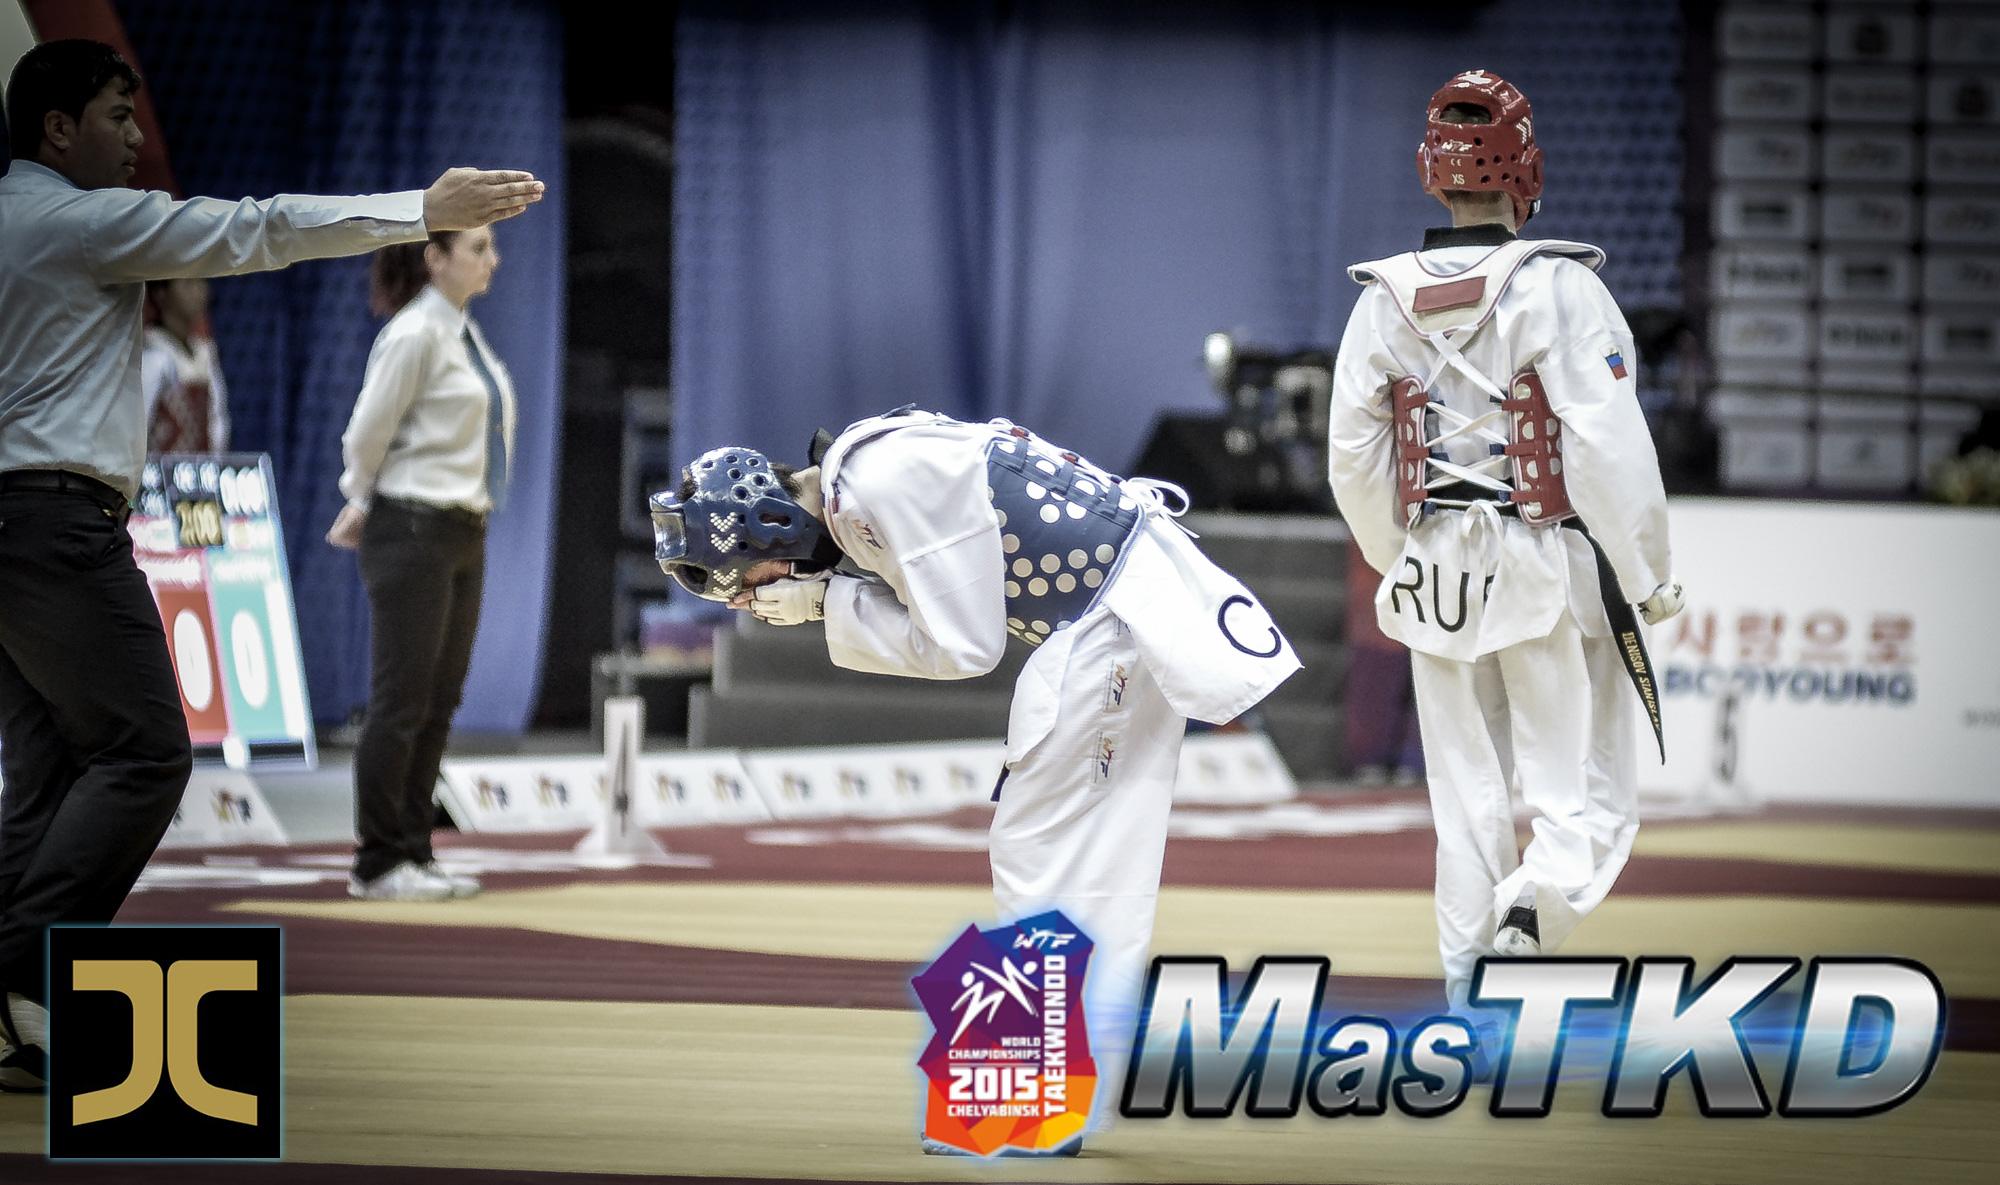 02_JCalicu-Mundial-Taekwondo-Mejores-Imagenes_DSC0167